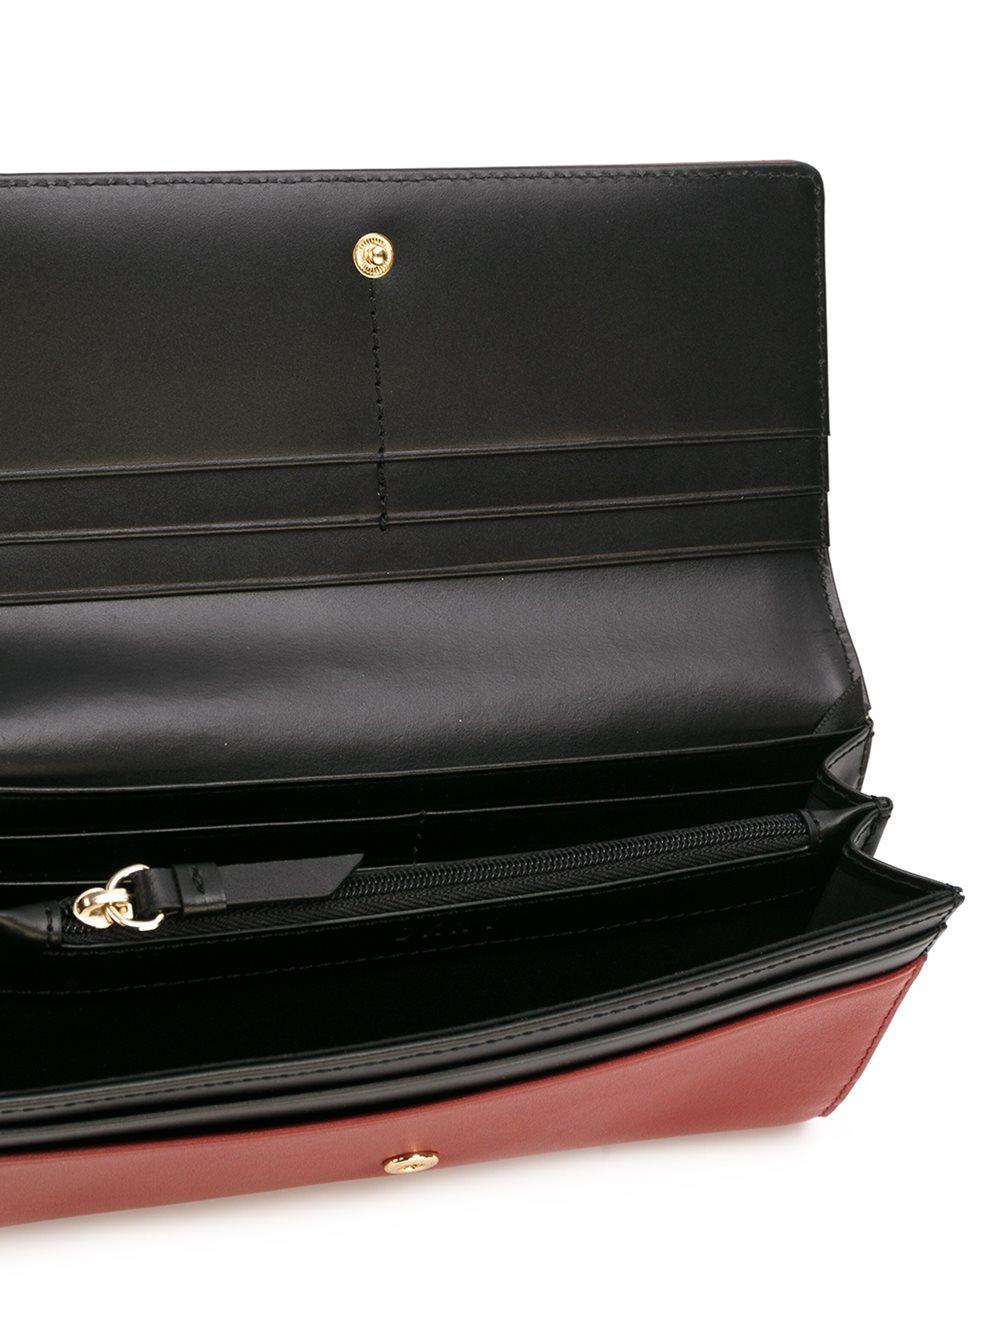 Lyst - Dkny Large Envelope Carryall Wallet in Gray |Dkny Wallet